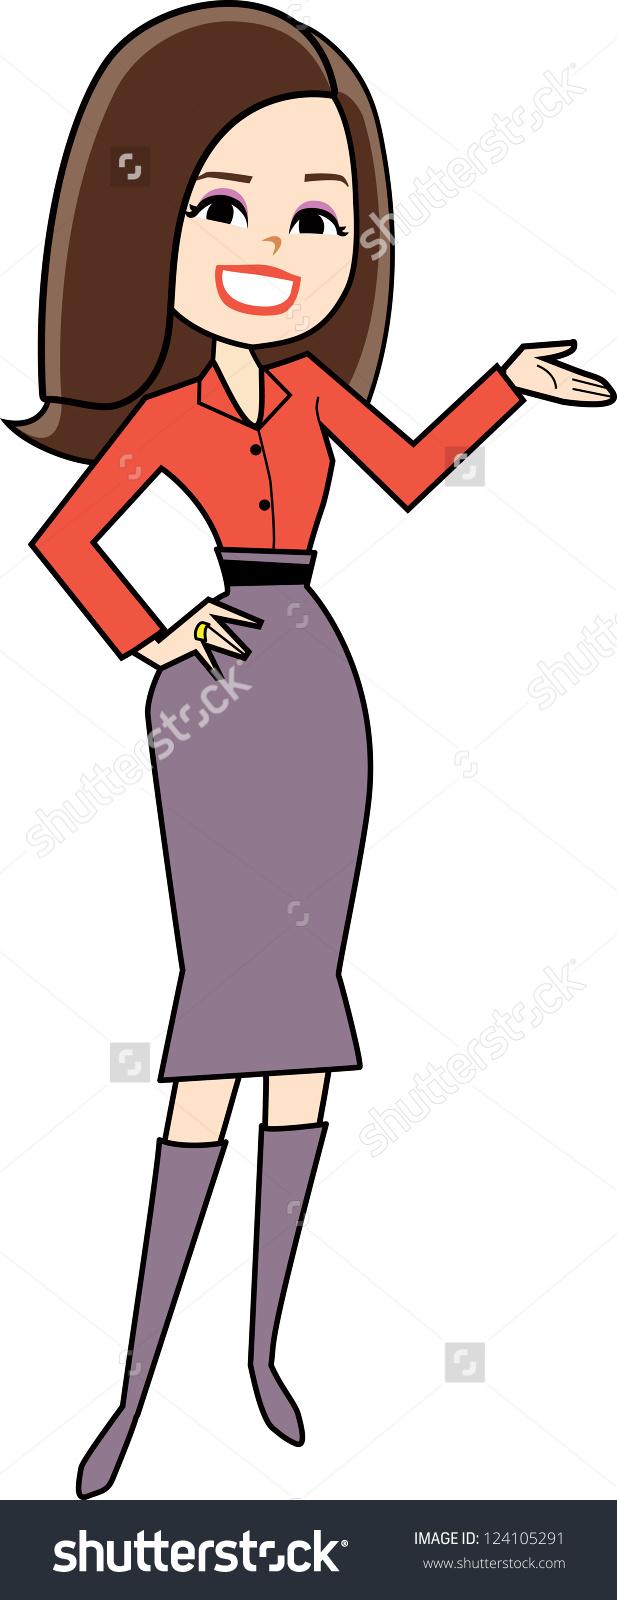 Cartoon Woman clip art in